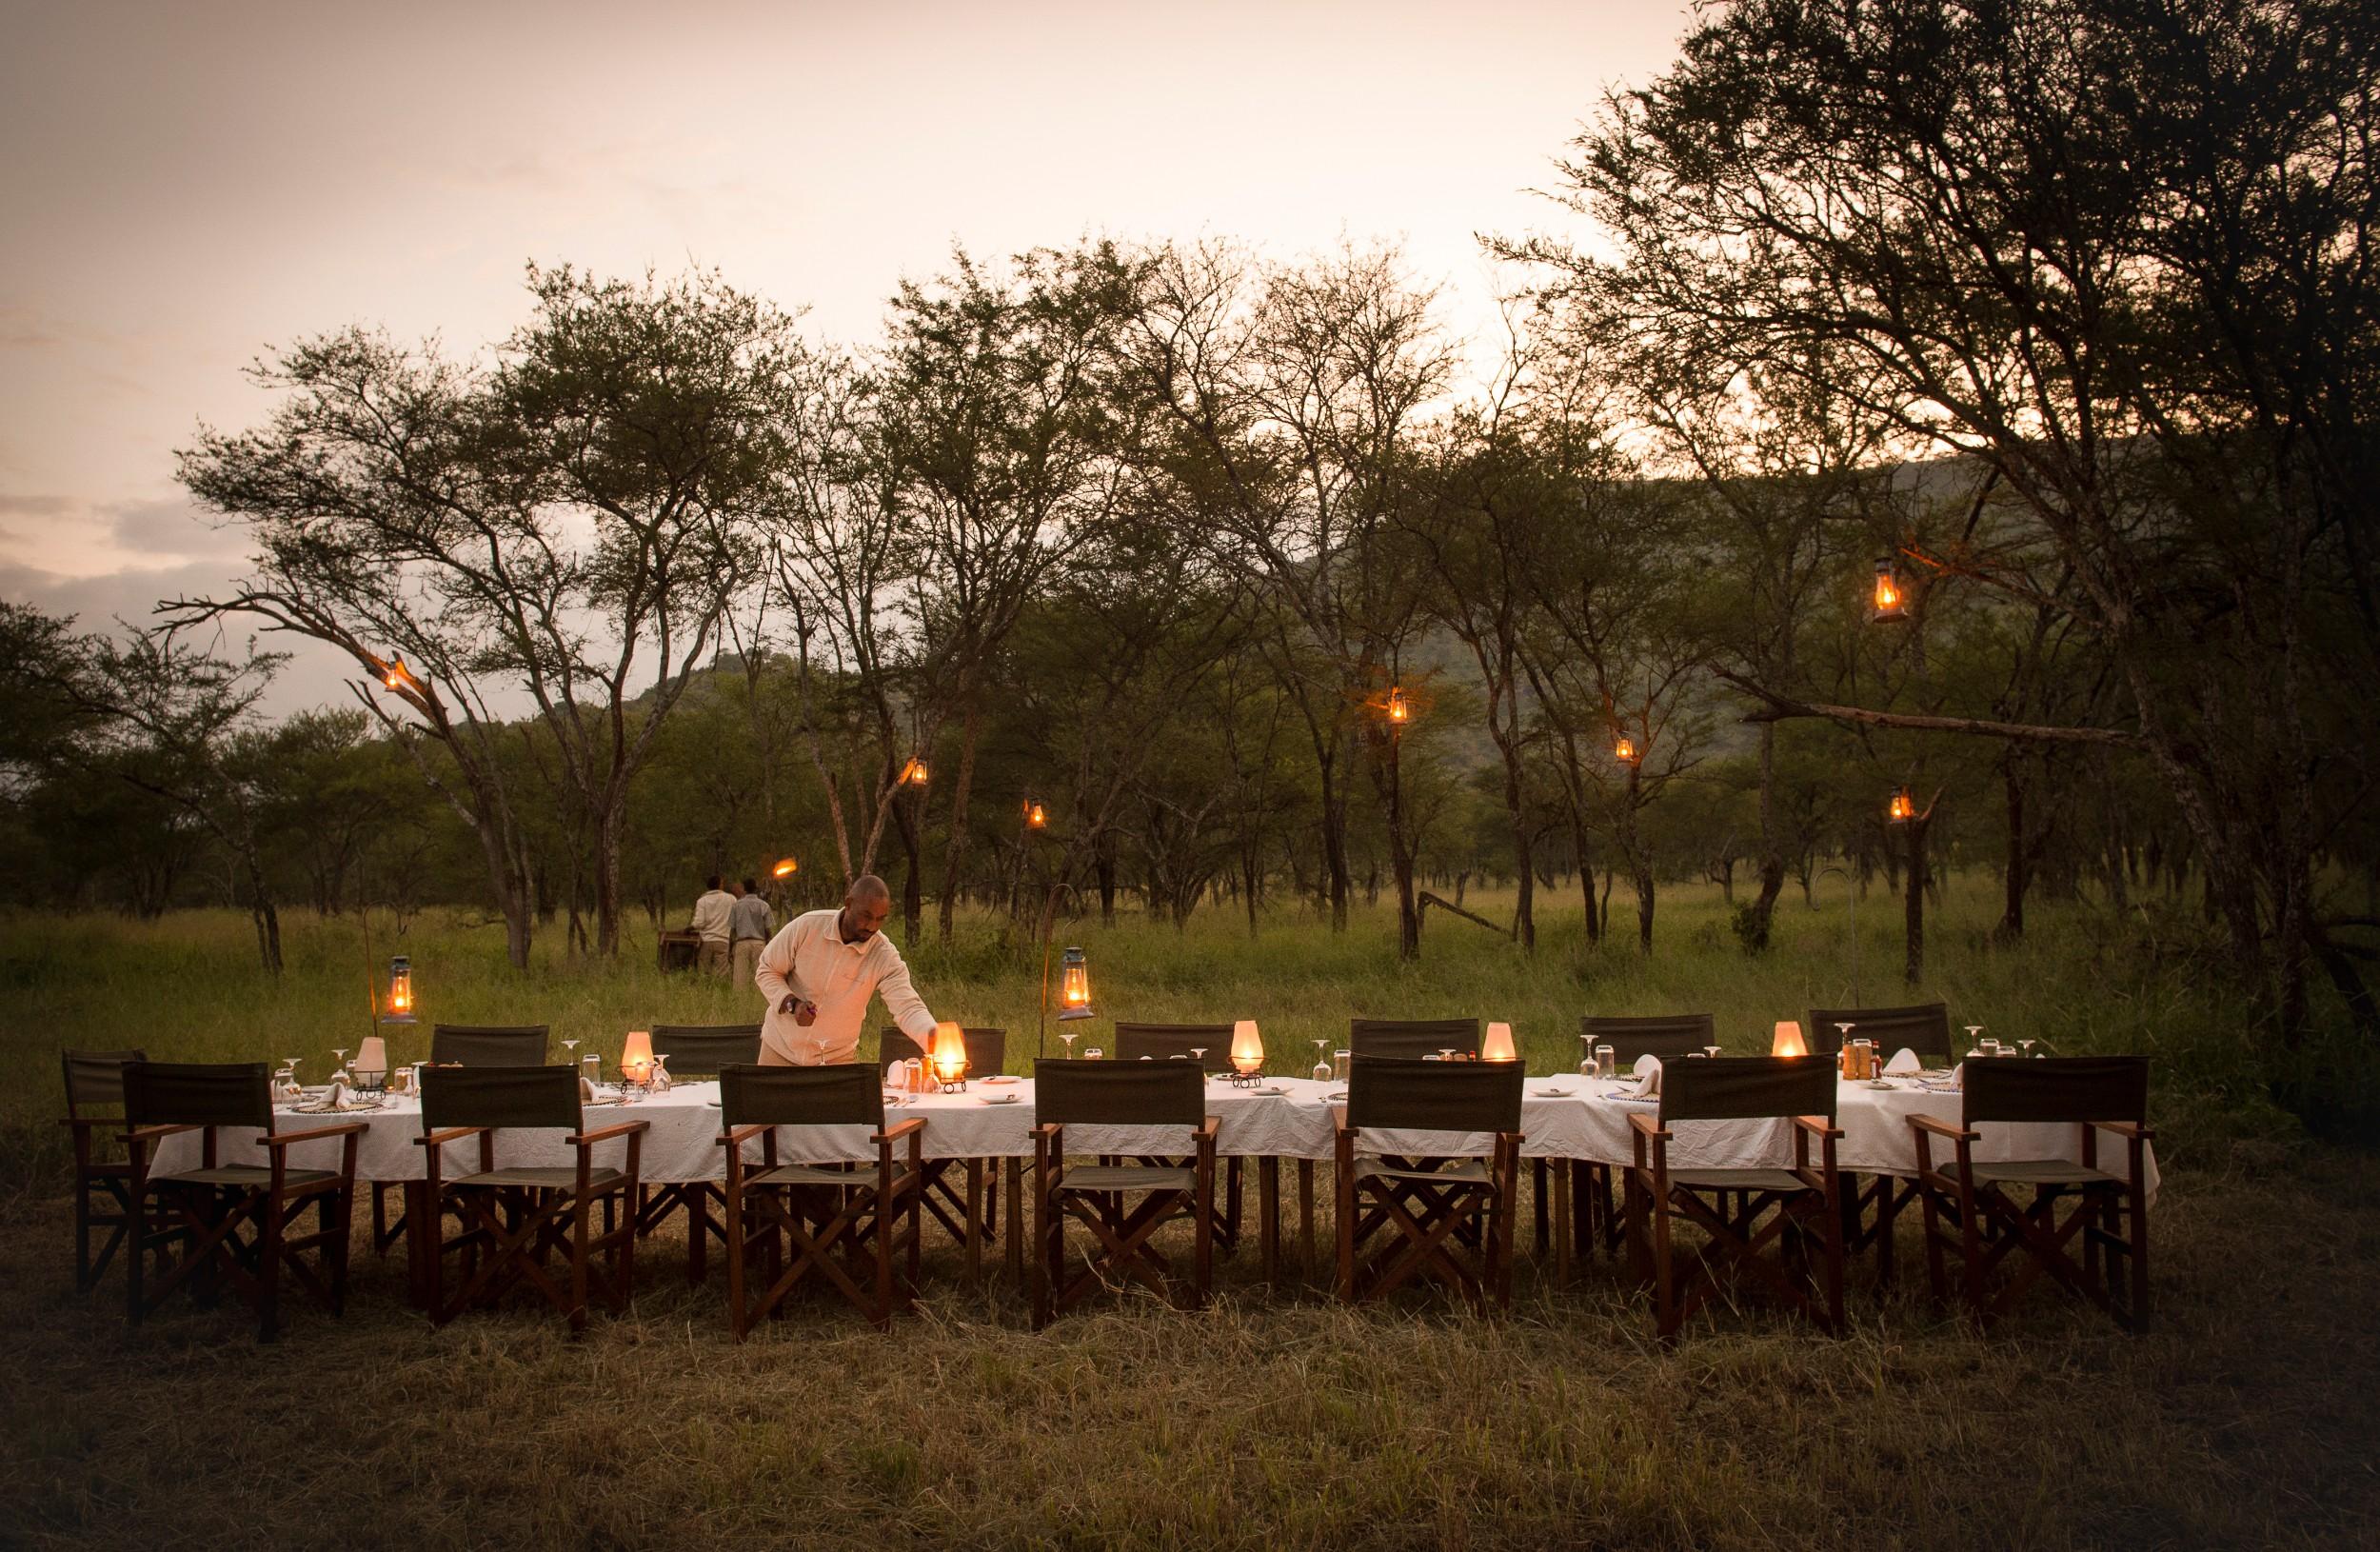 Dunia-Camp-Staff-dinner-table-HR-Eliza-Deacon.jpg